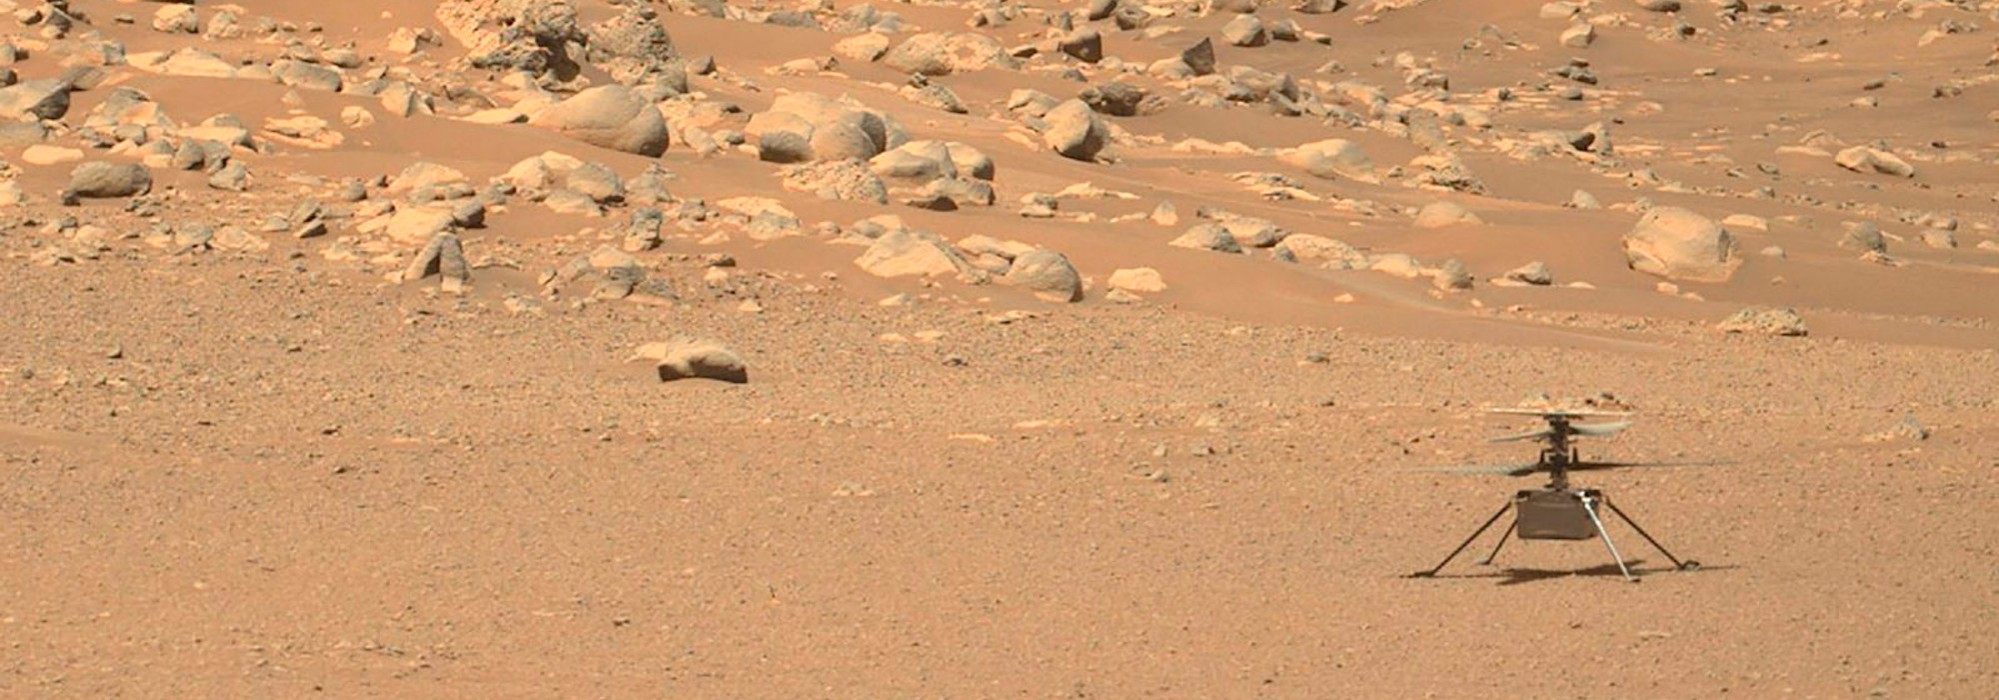 Mars'ta Helikopter Uçurduk